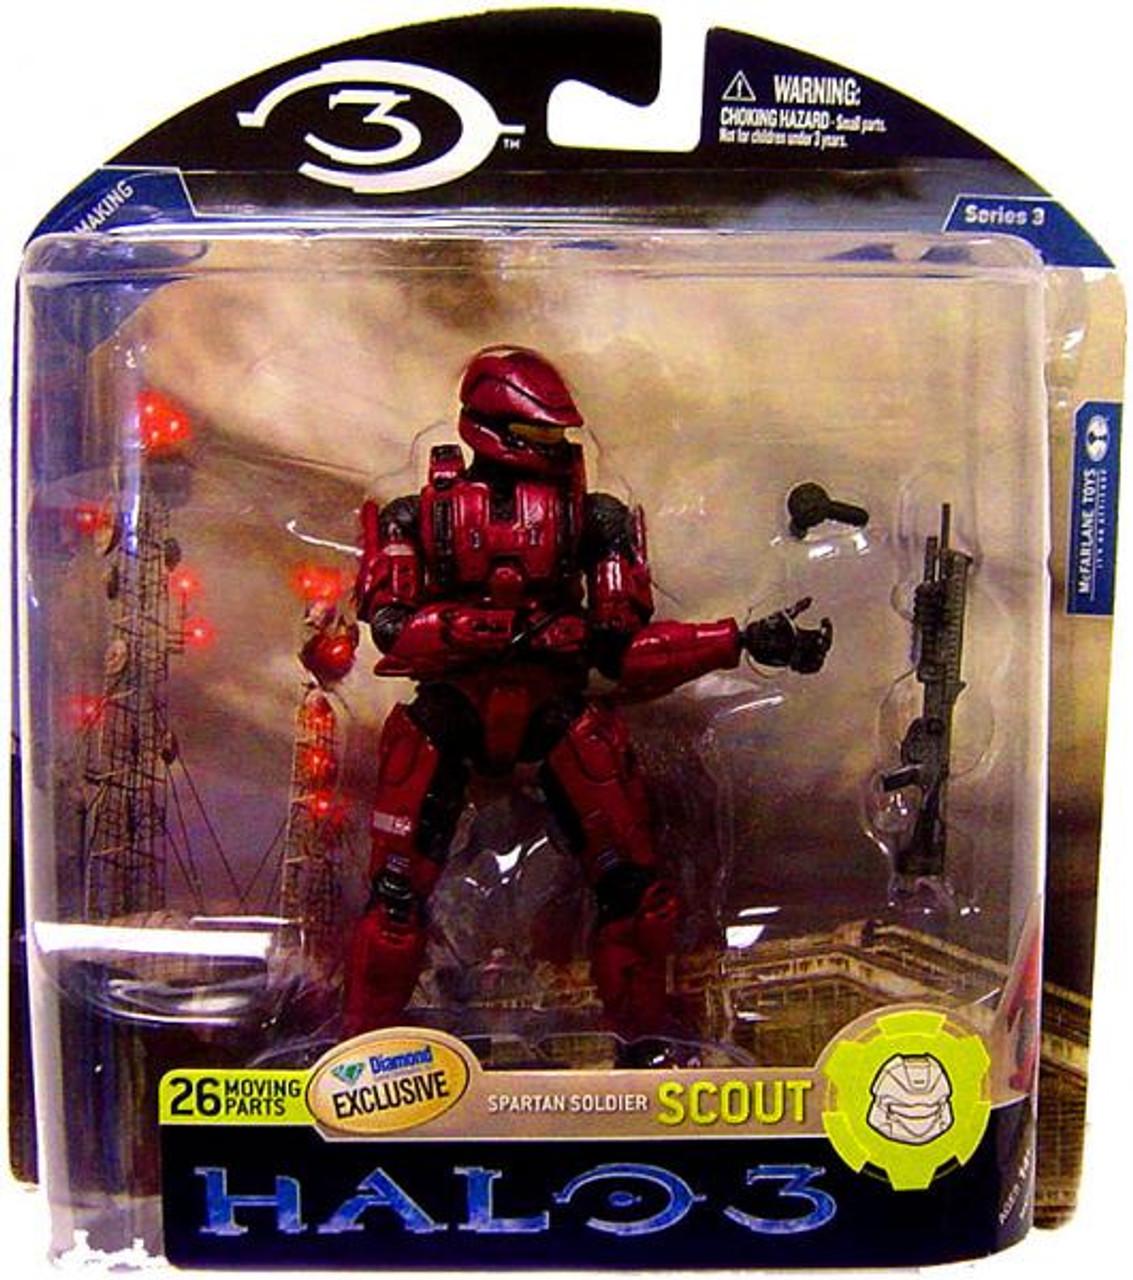 McFarlane Toys Halo 3 Series 3 Spartan Soldier Scout Exclusive Action Figure [Crimson]